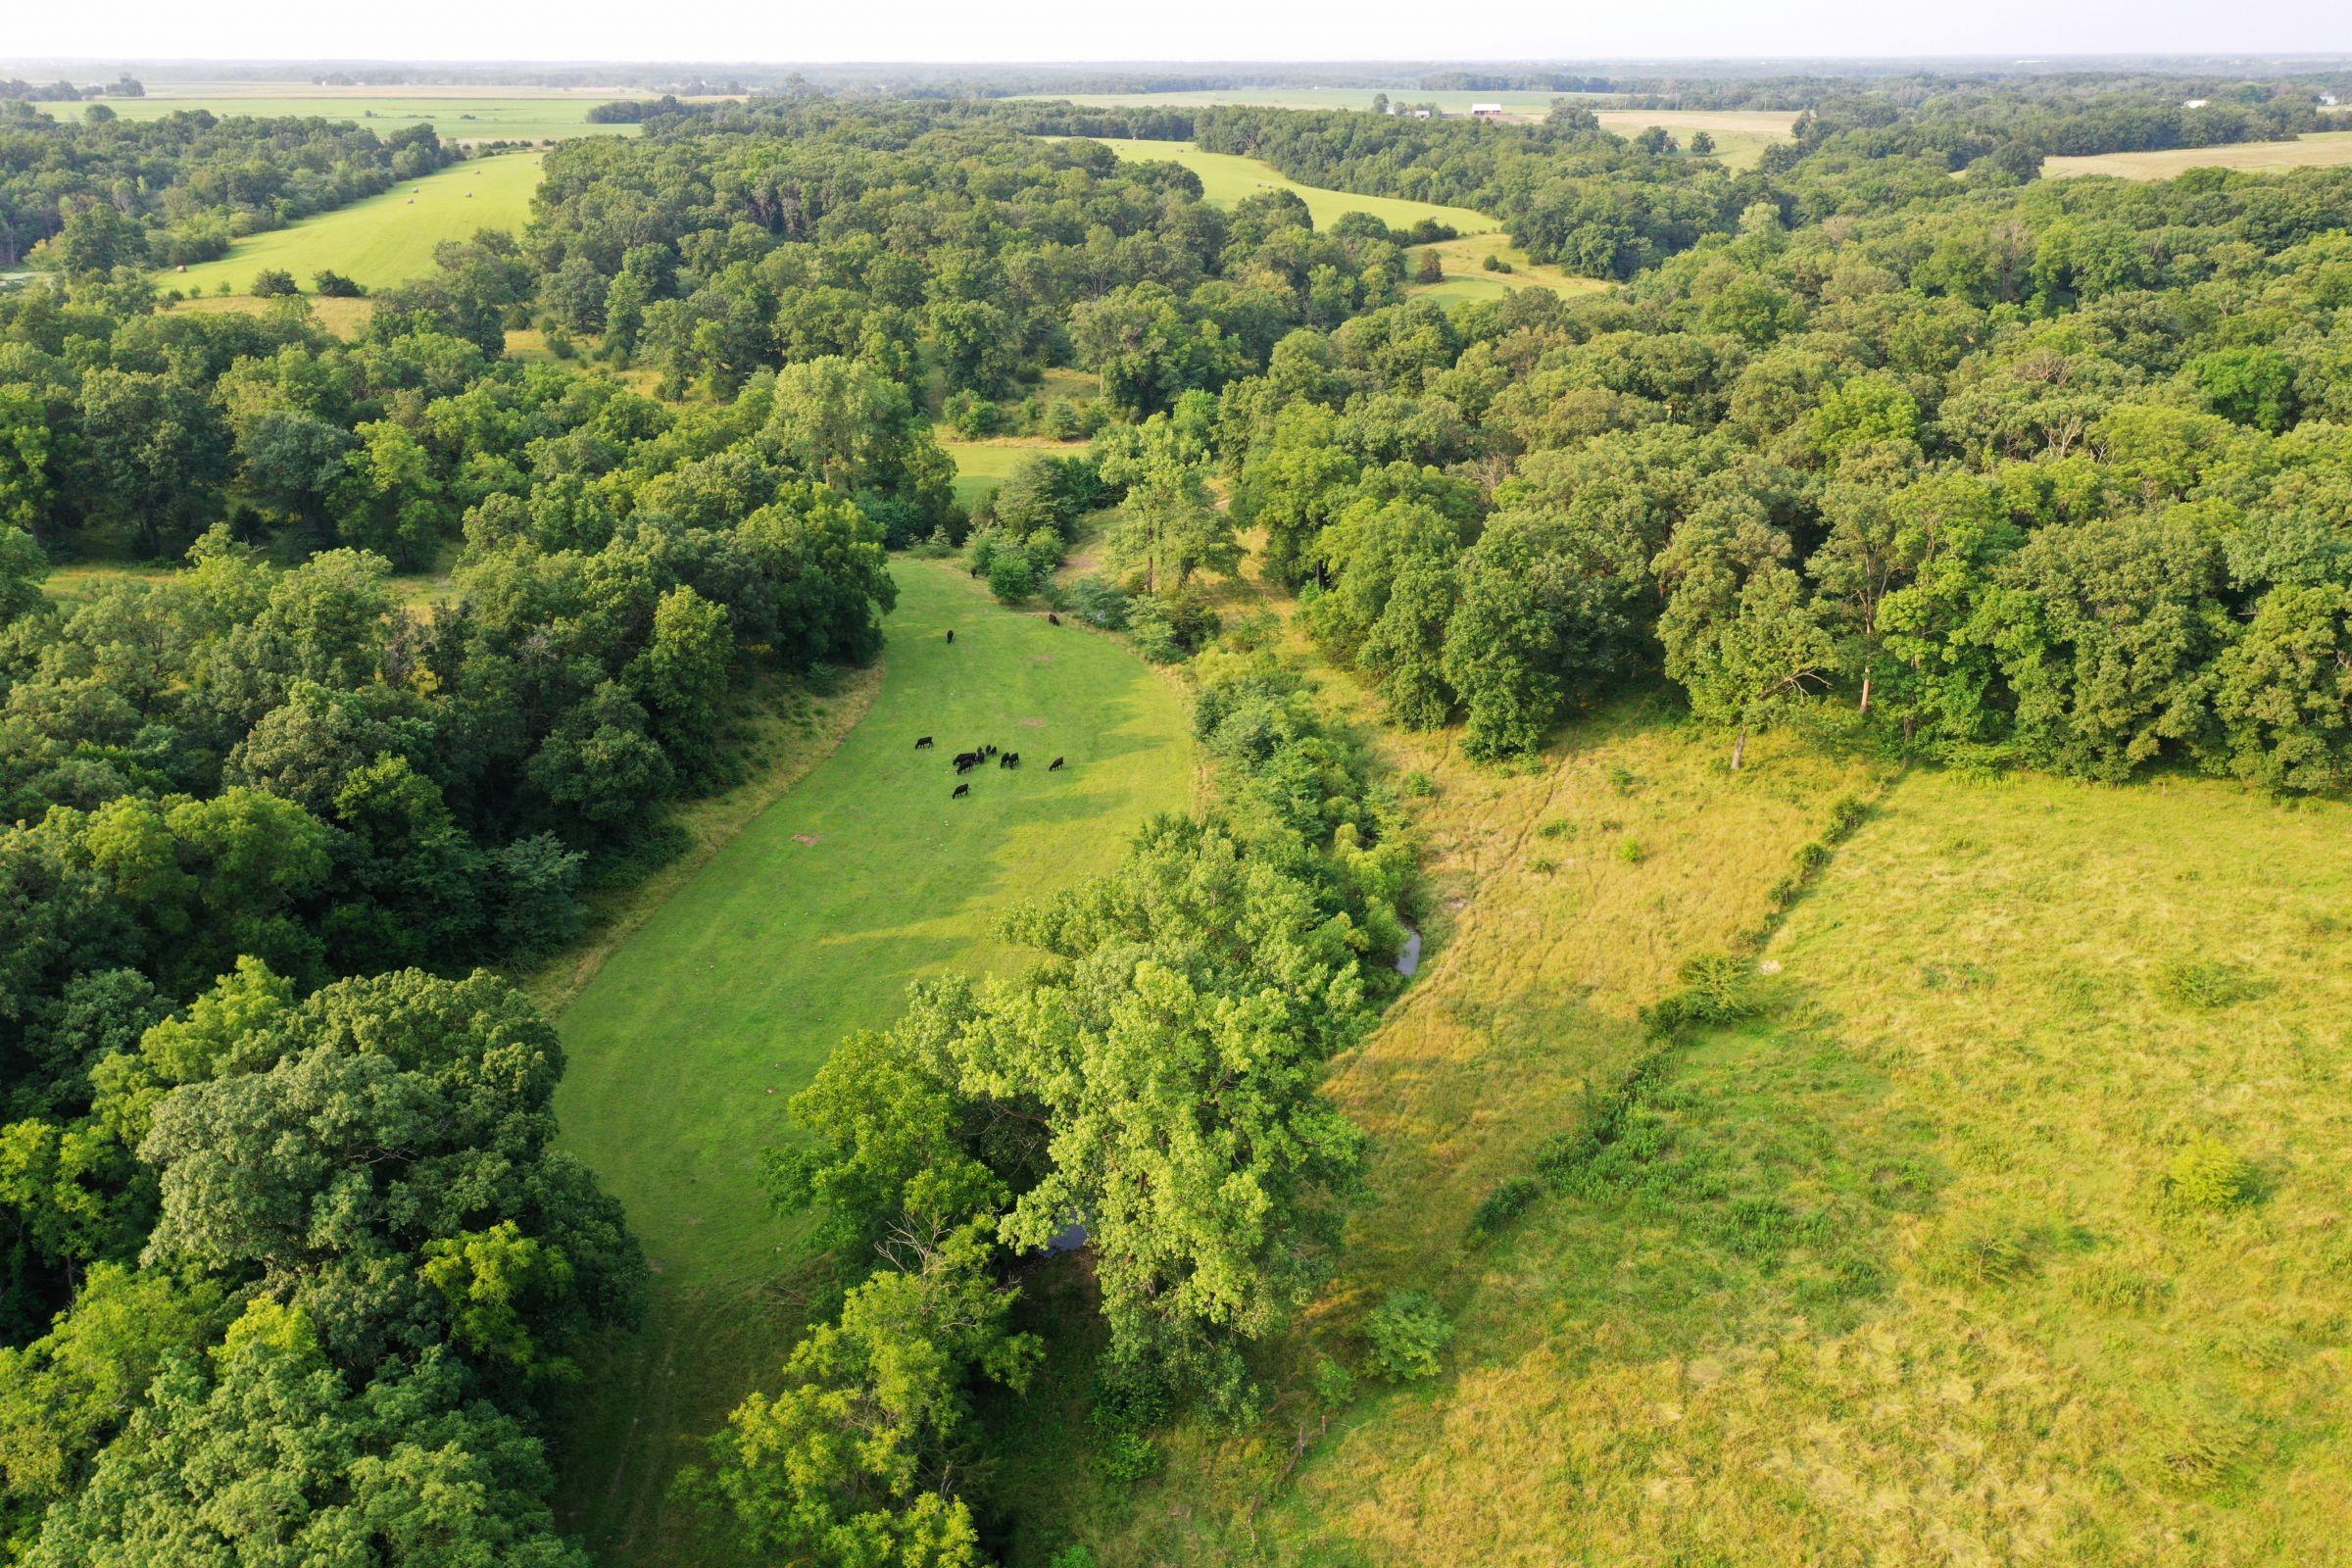 land-lee-county-iowa-340-acres-listing-number-15649-9-2021-07-21-185549.jpg